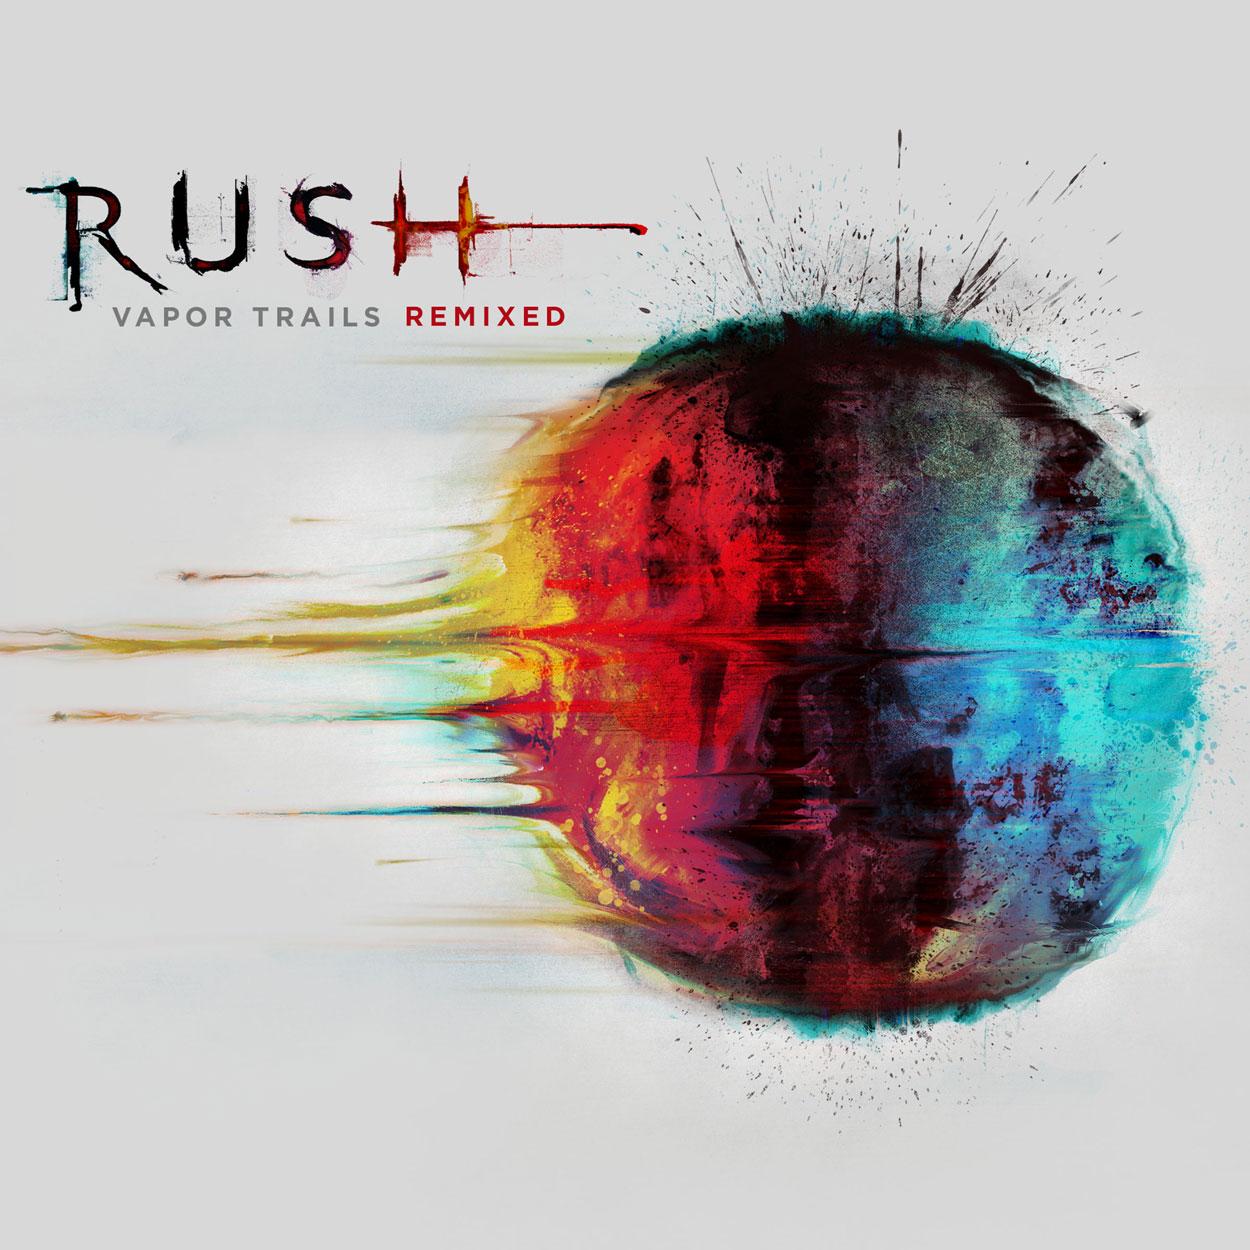 Rush / Vapor Trails remixed